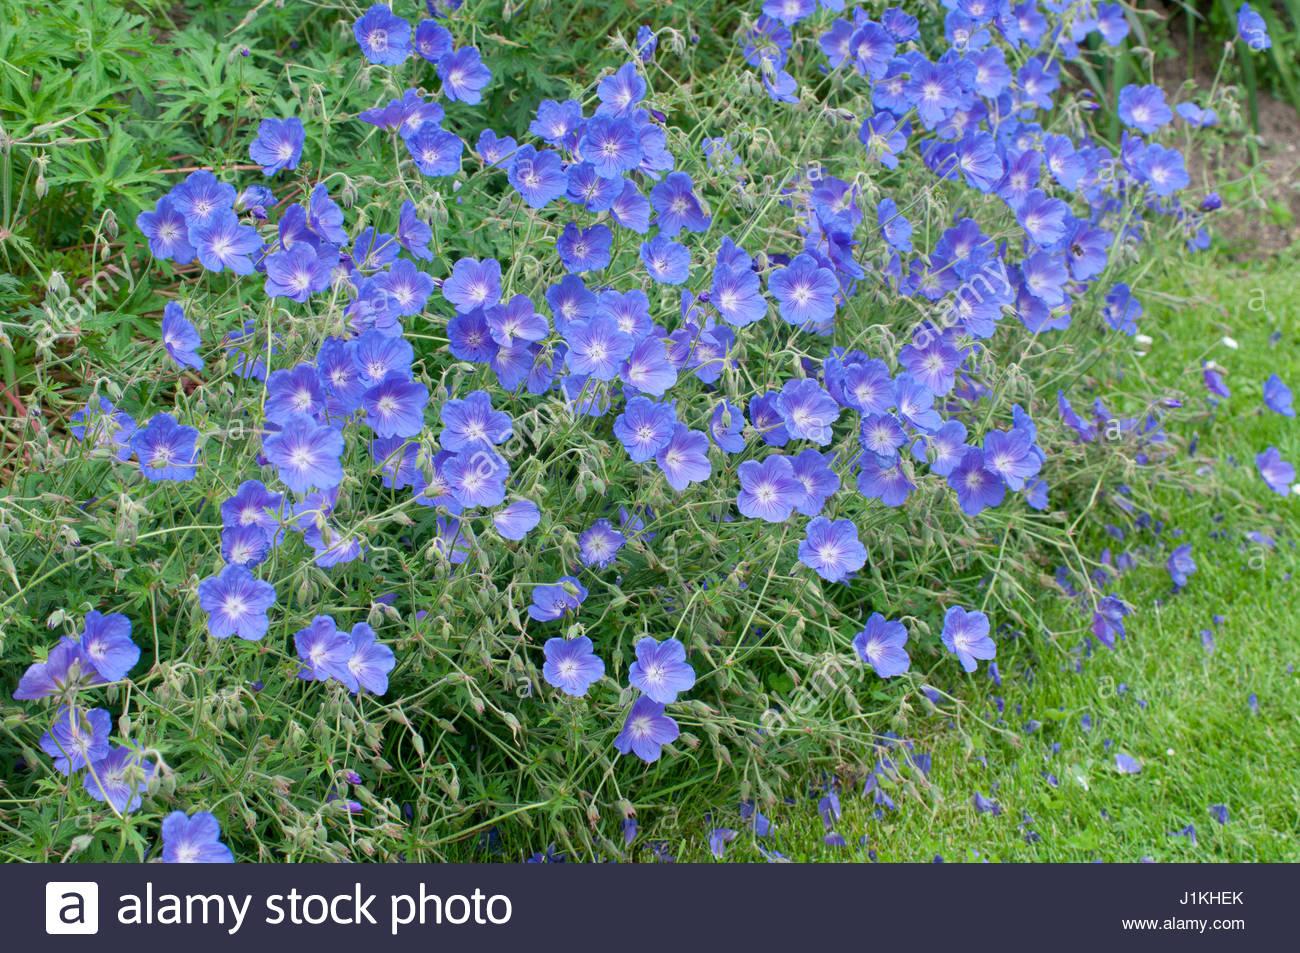 geranium vivace 39 orion 39 plante vivace stock photo royalty free image 138728427 alamy. Black Bedroom Furniture Sets. Home Design Ideas